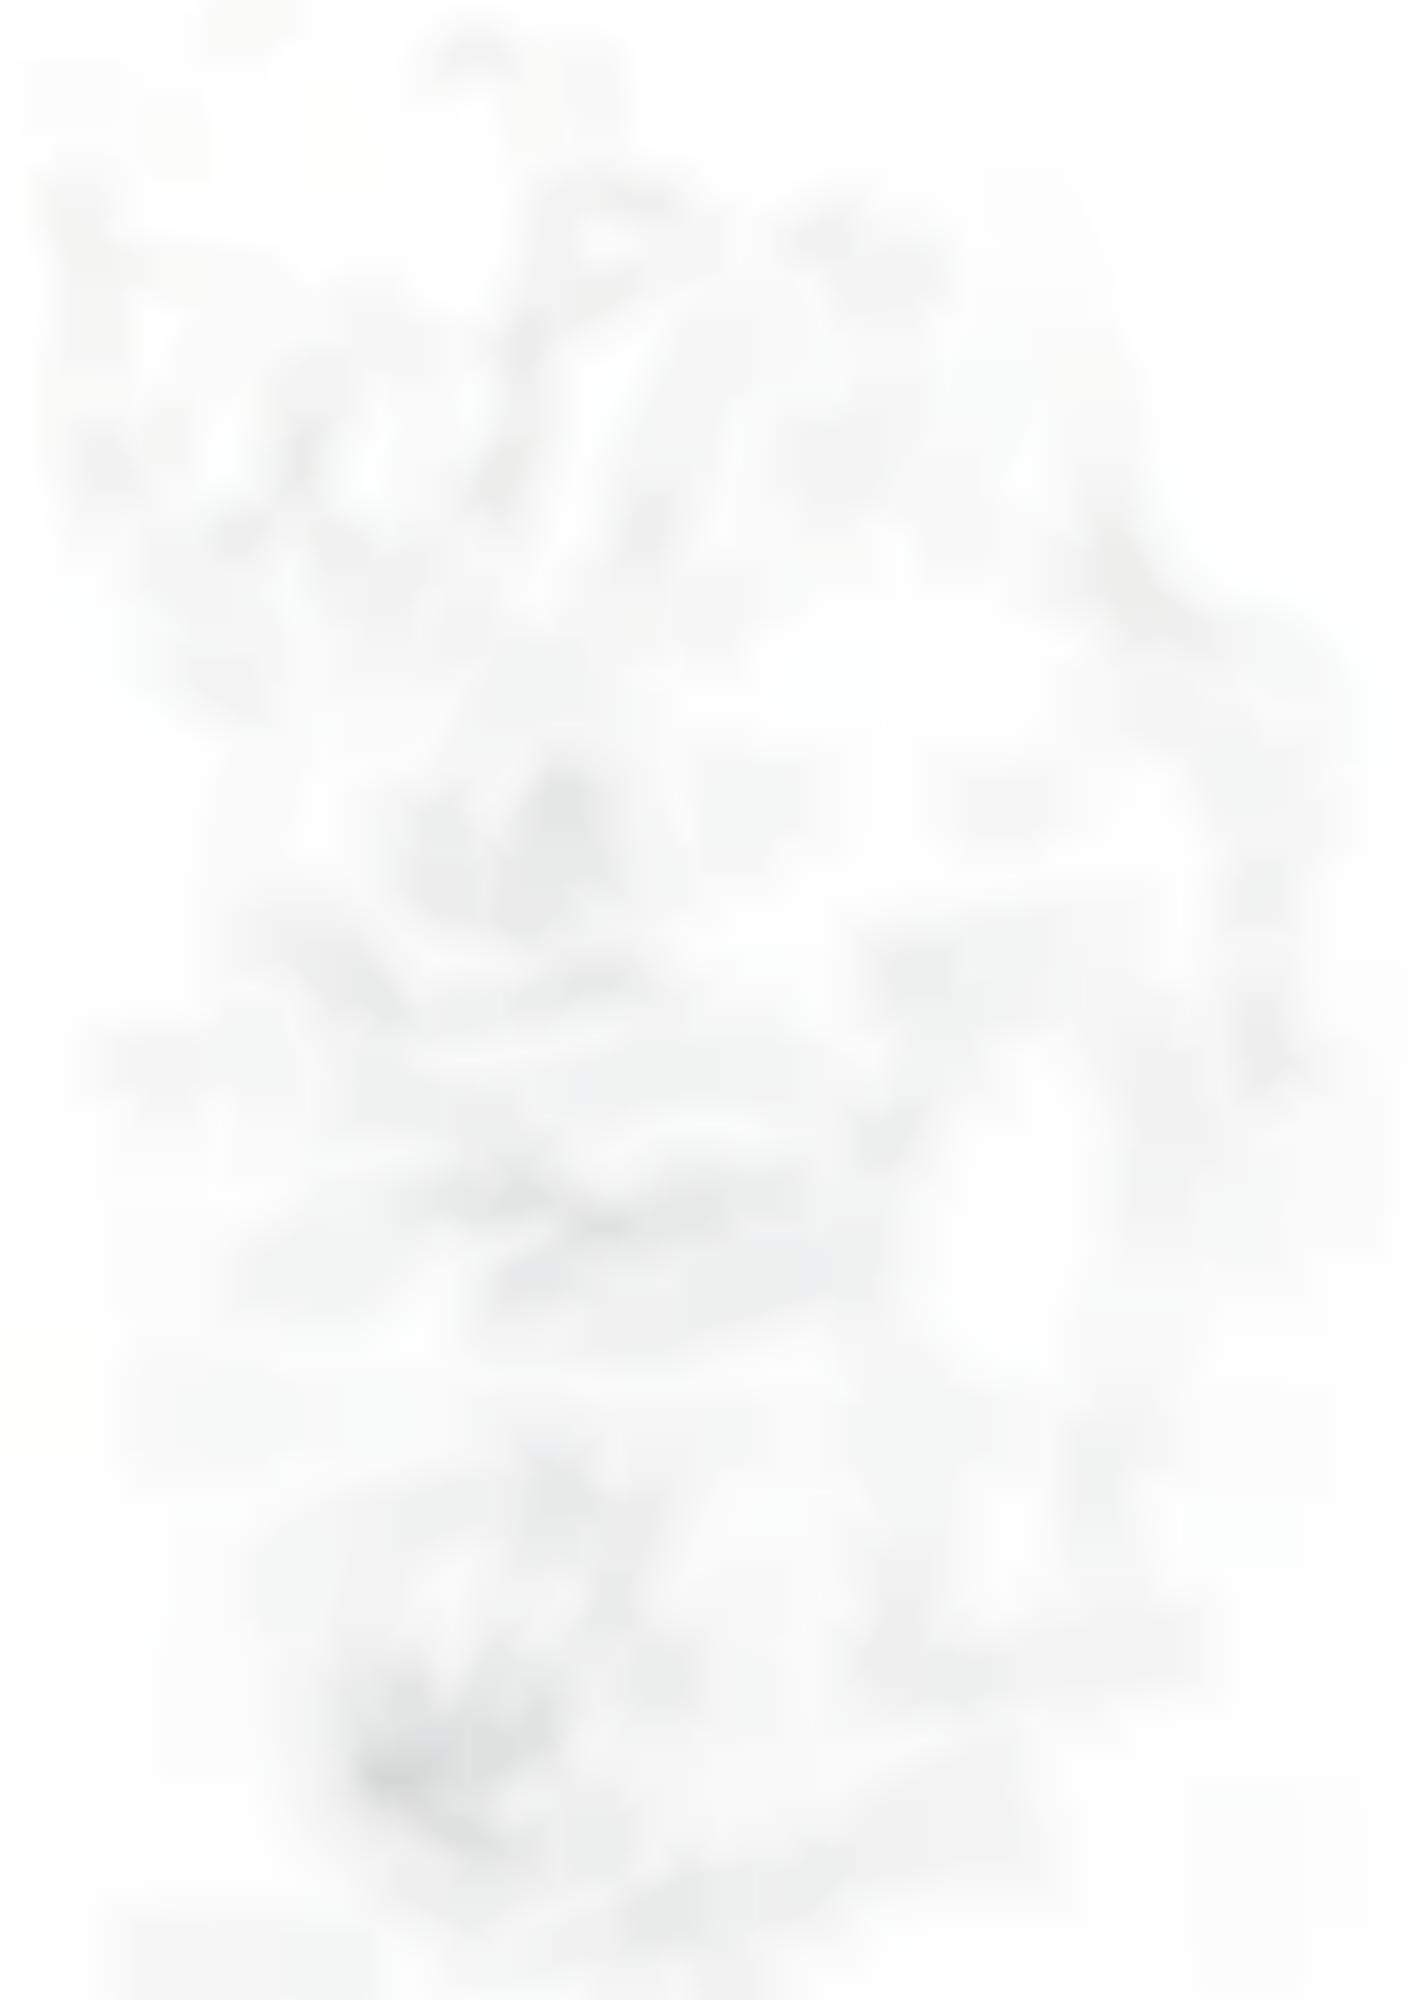 Georg Baselitz-Untitled-1989